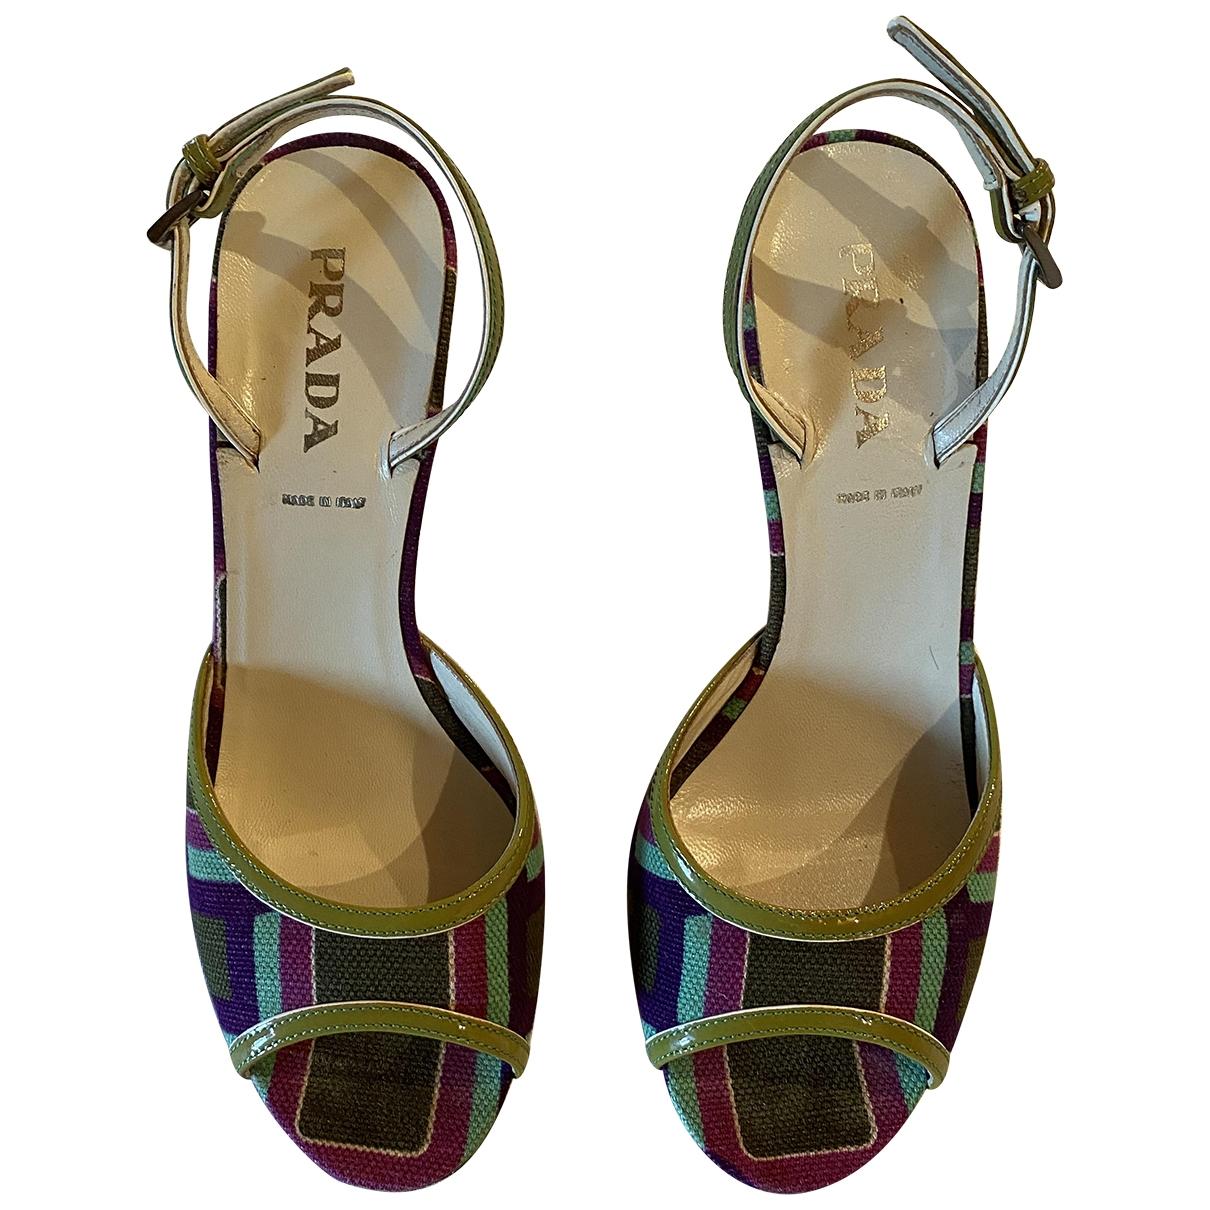 Prada \N Multicolour Leather Sandals for Women 37 EU